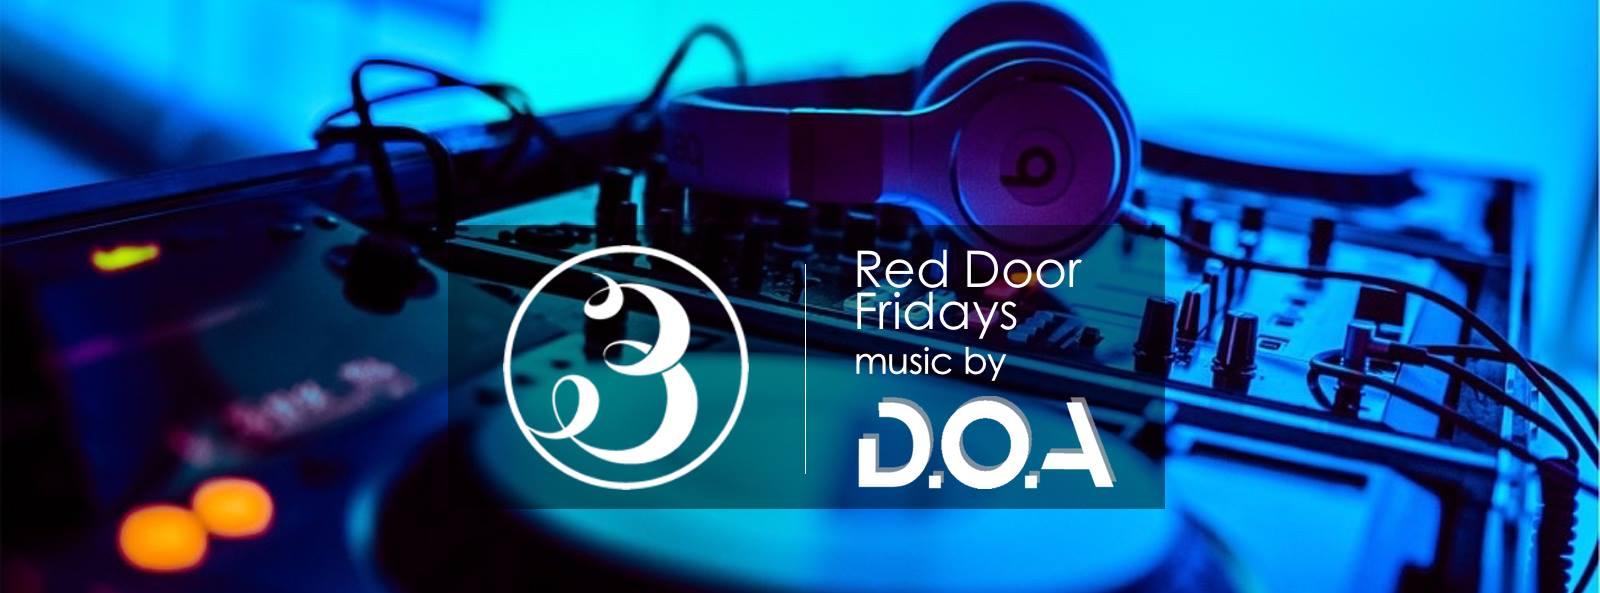 Red Door Fridays With Doa North Cyprus Online Magazine